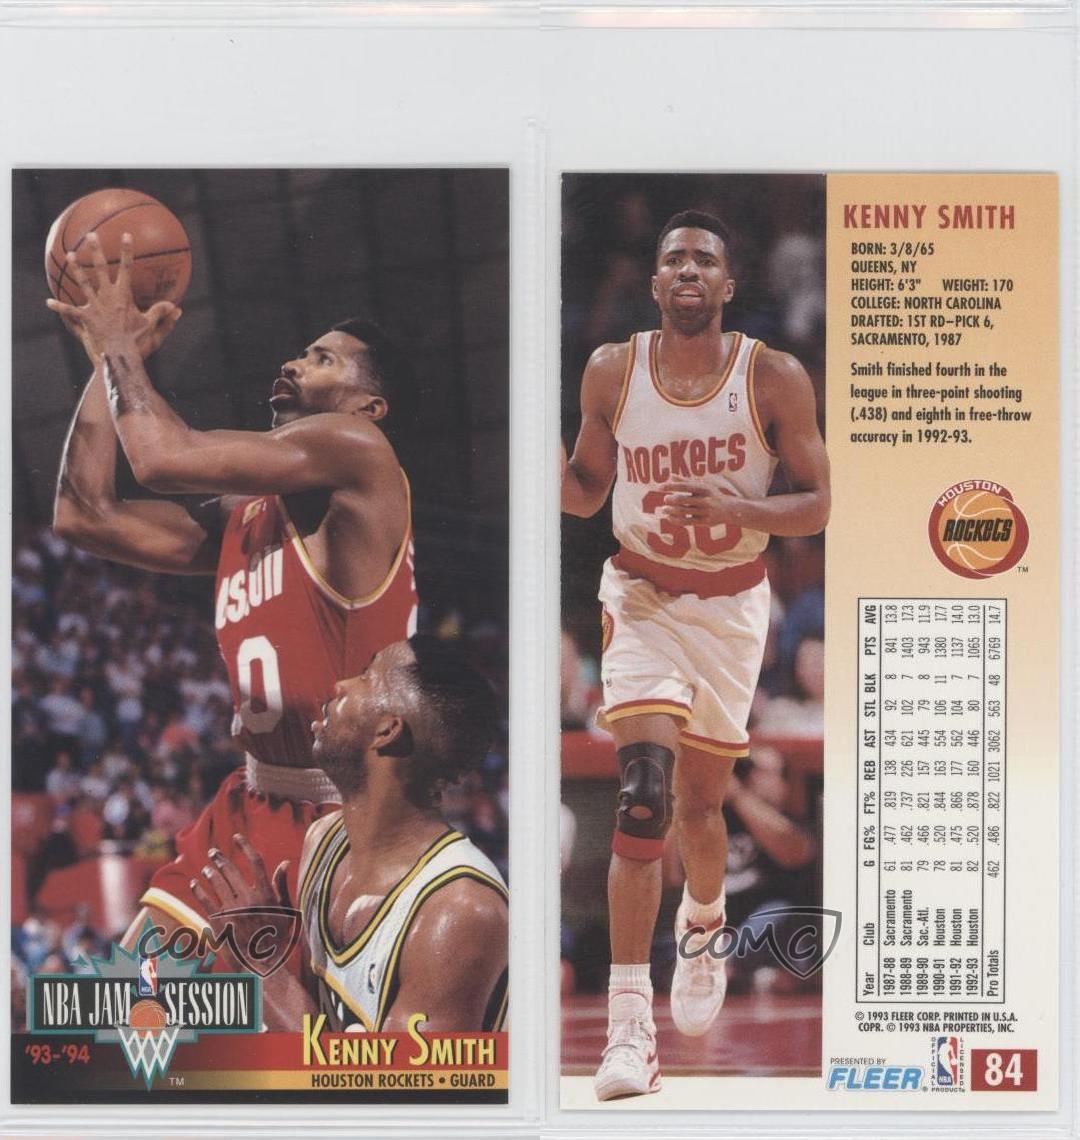 1993-94 NBA Jam Session #84 Kenny Smith Houston Rockets